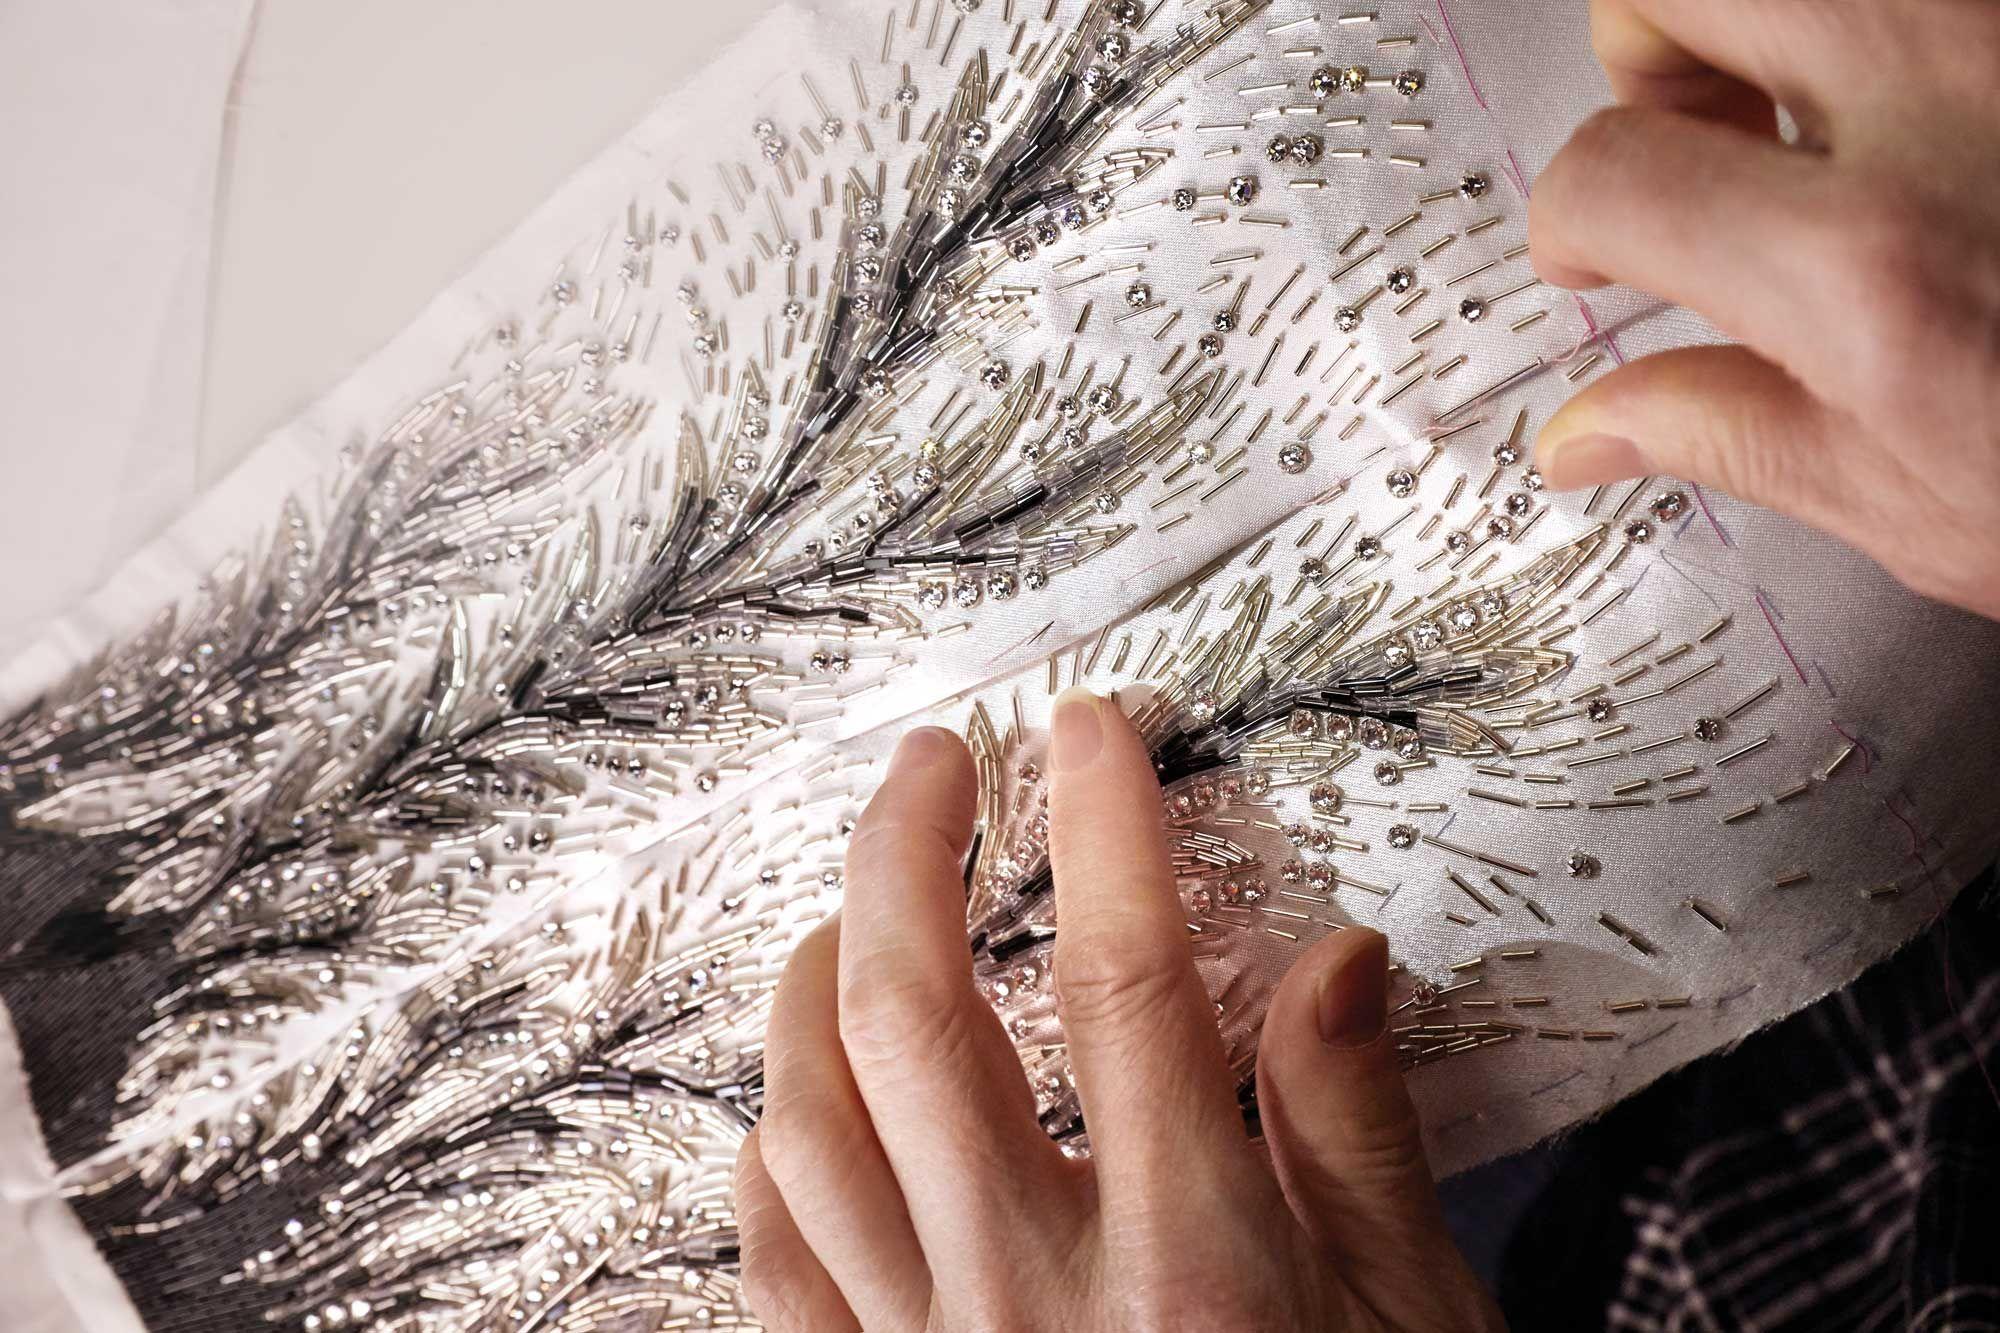 A Closer Look At Louis Vuitton's Autumn/Winter 2018 Collection